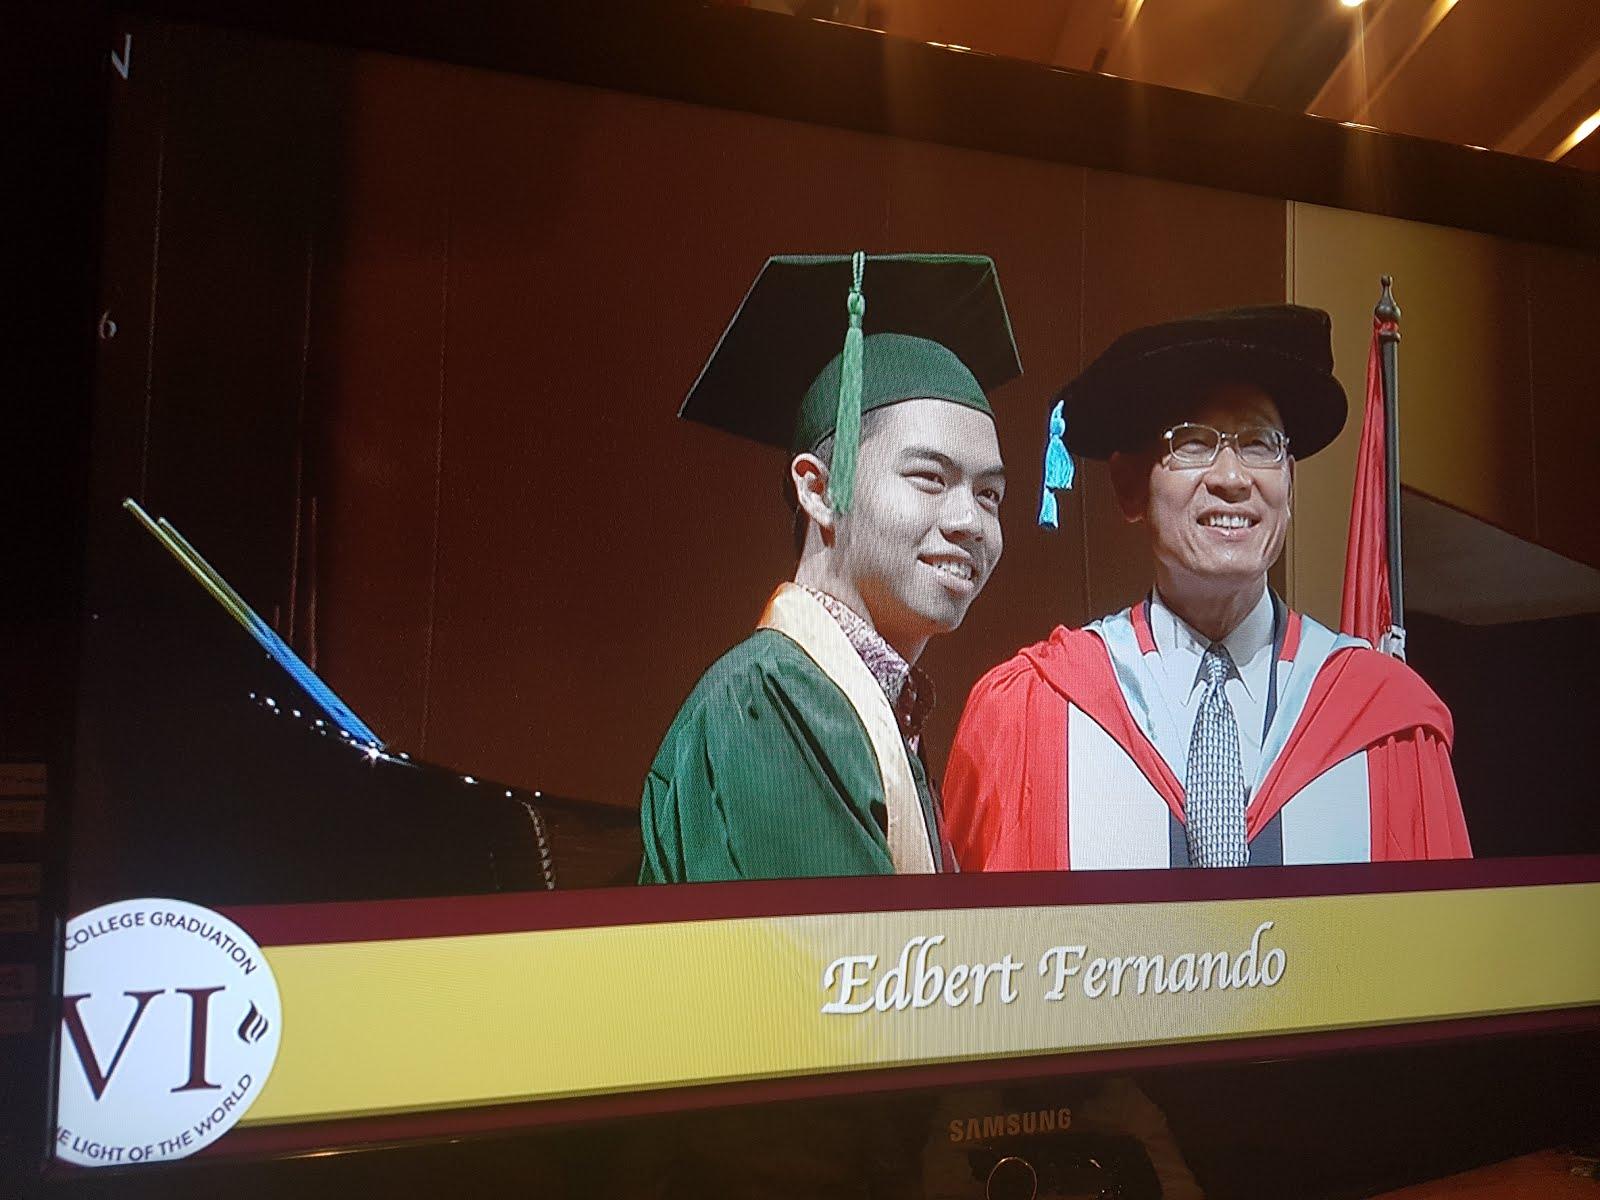 Edbert Fernando & James Riady